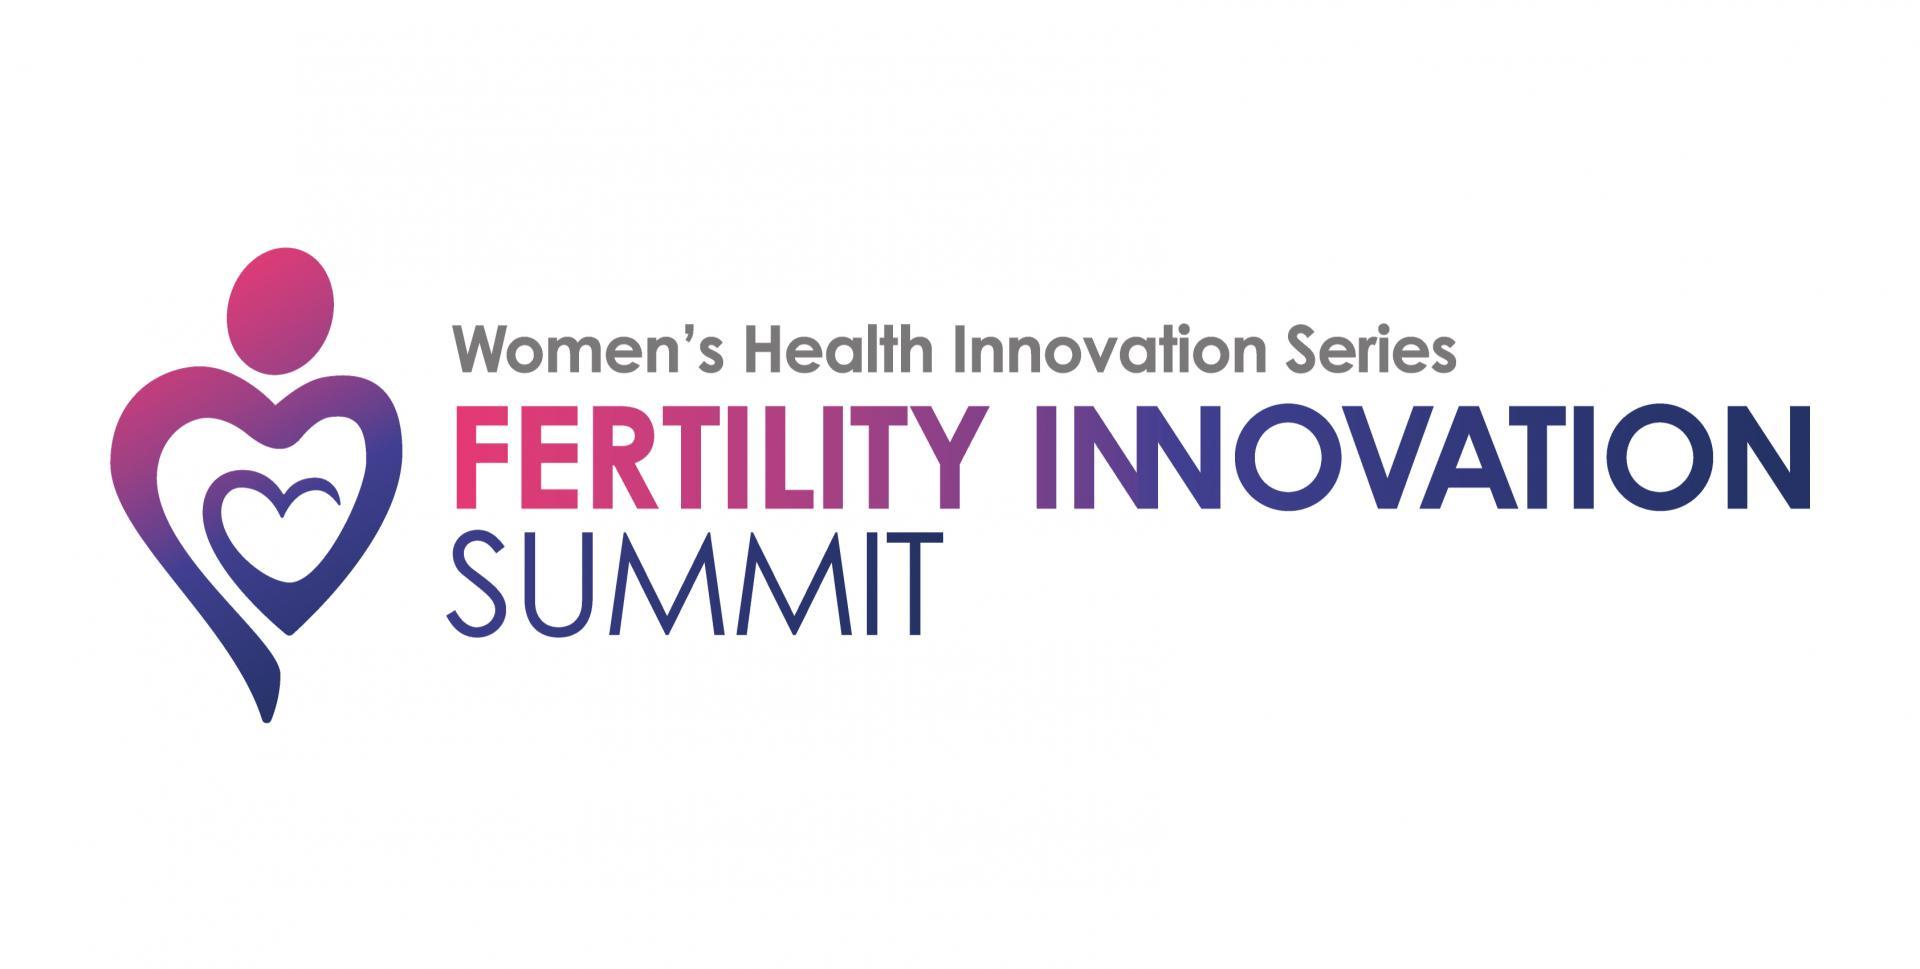 Women's Health Innovation Series: Fertility Innovation Summit